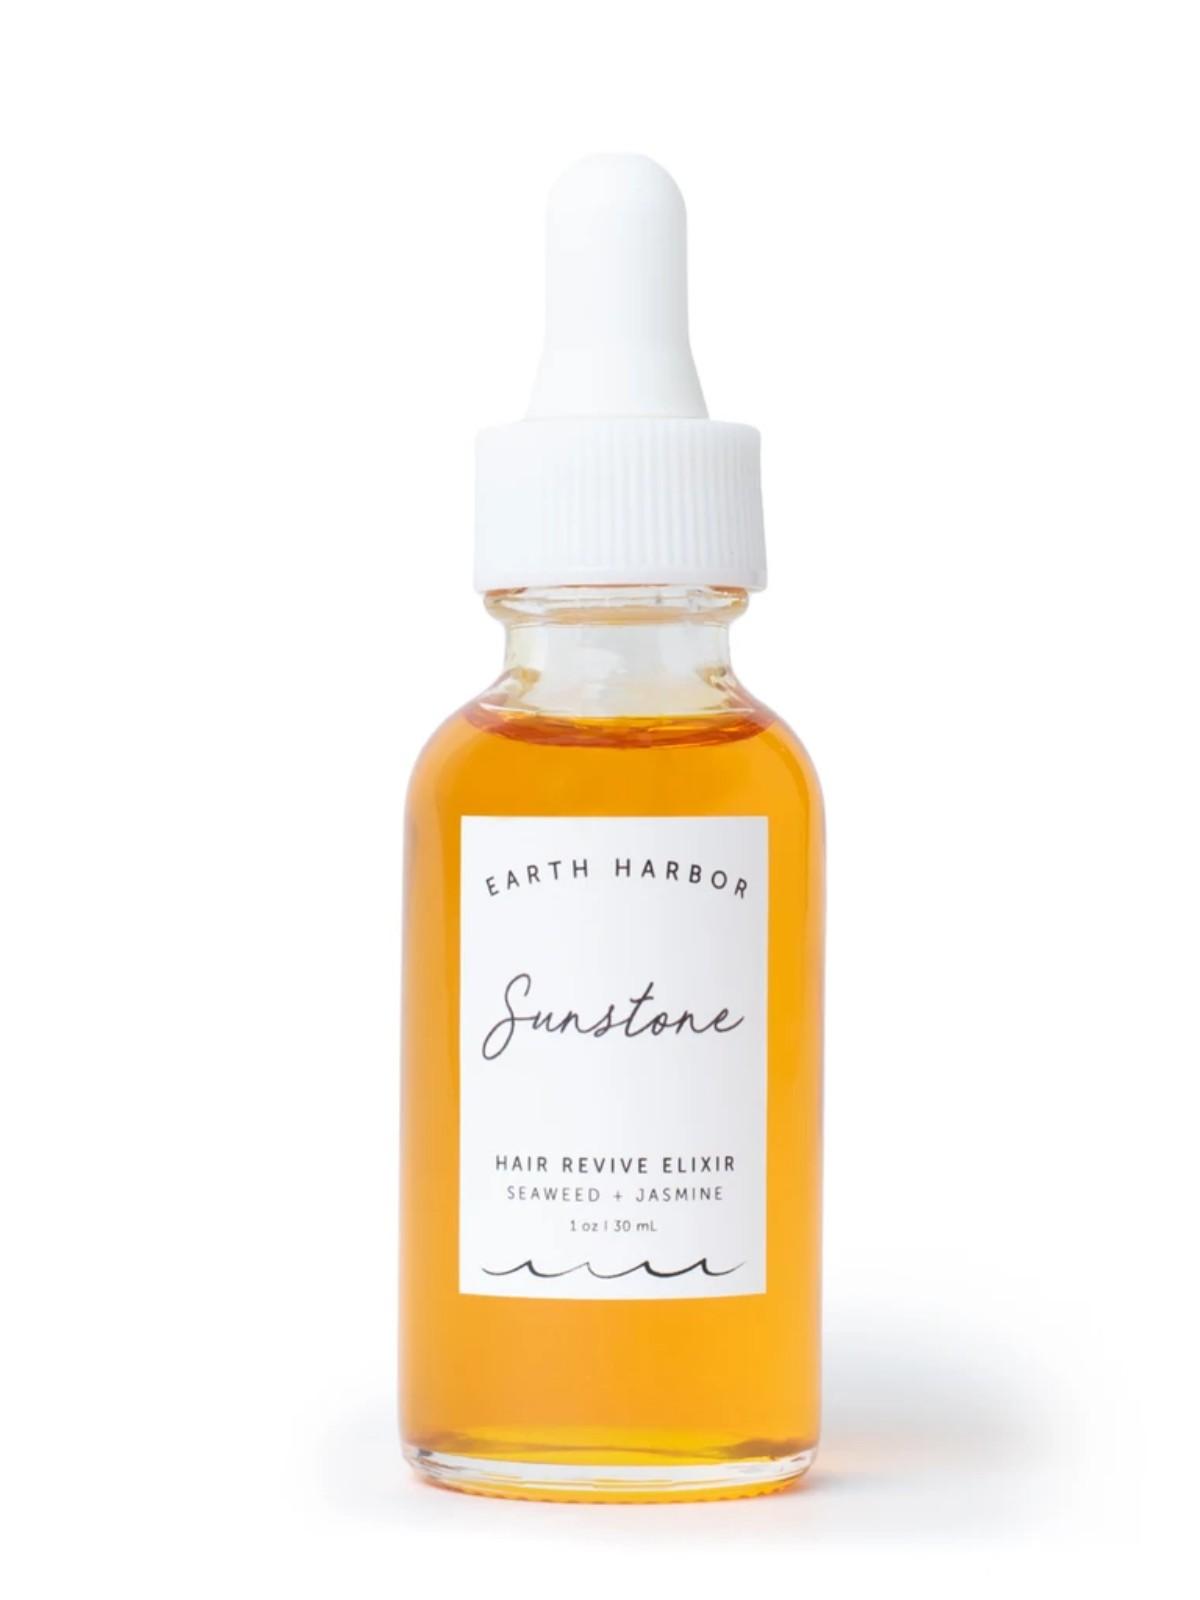 SUNSTONE Hair Revive Elixir